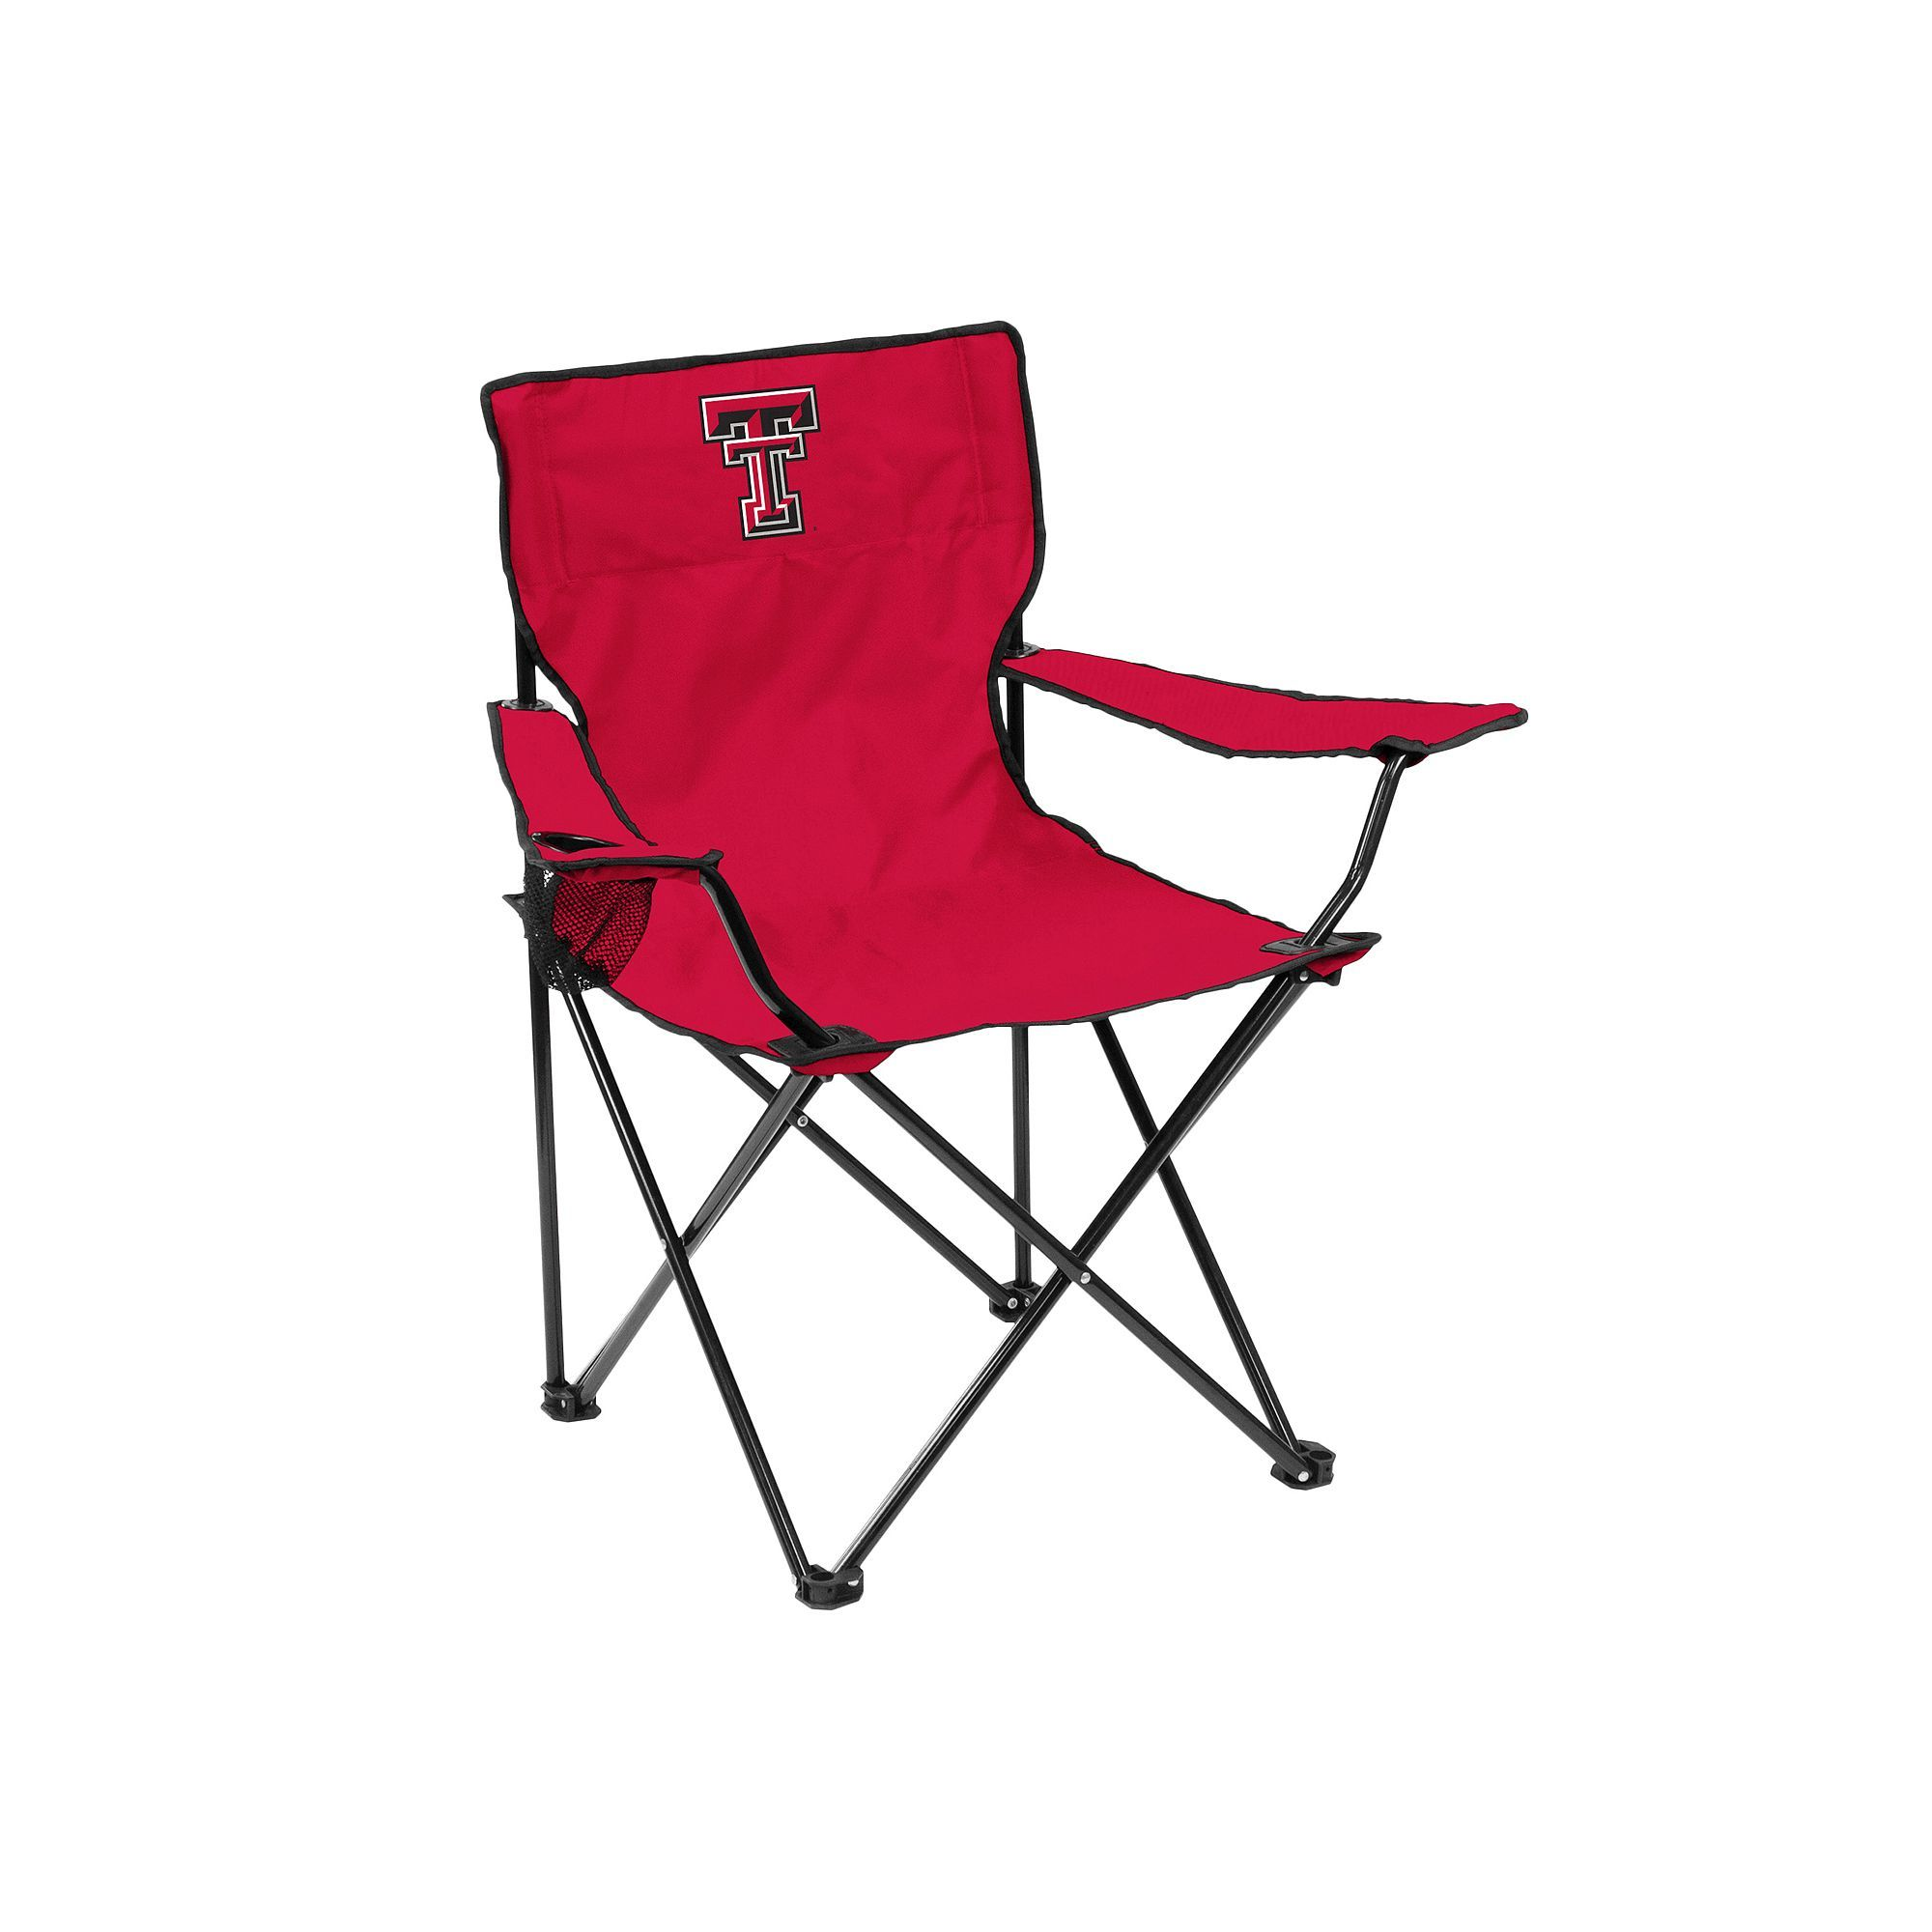 Outdoor Logo Brand Texas Tech Red Raiders Portable Folding Chair